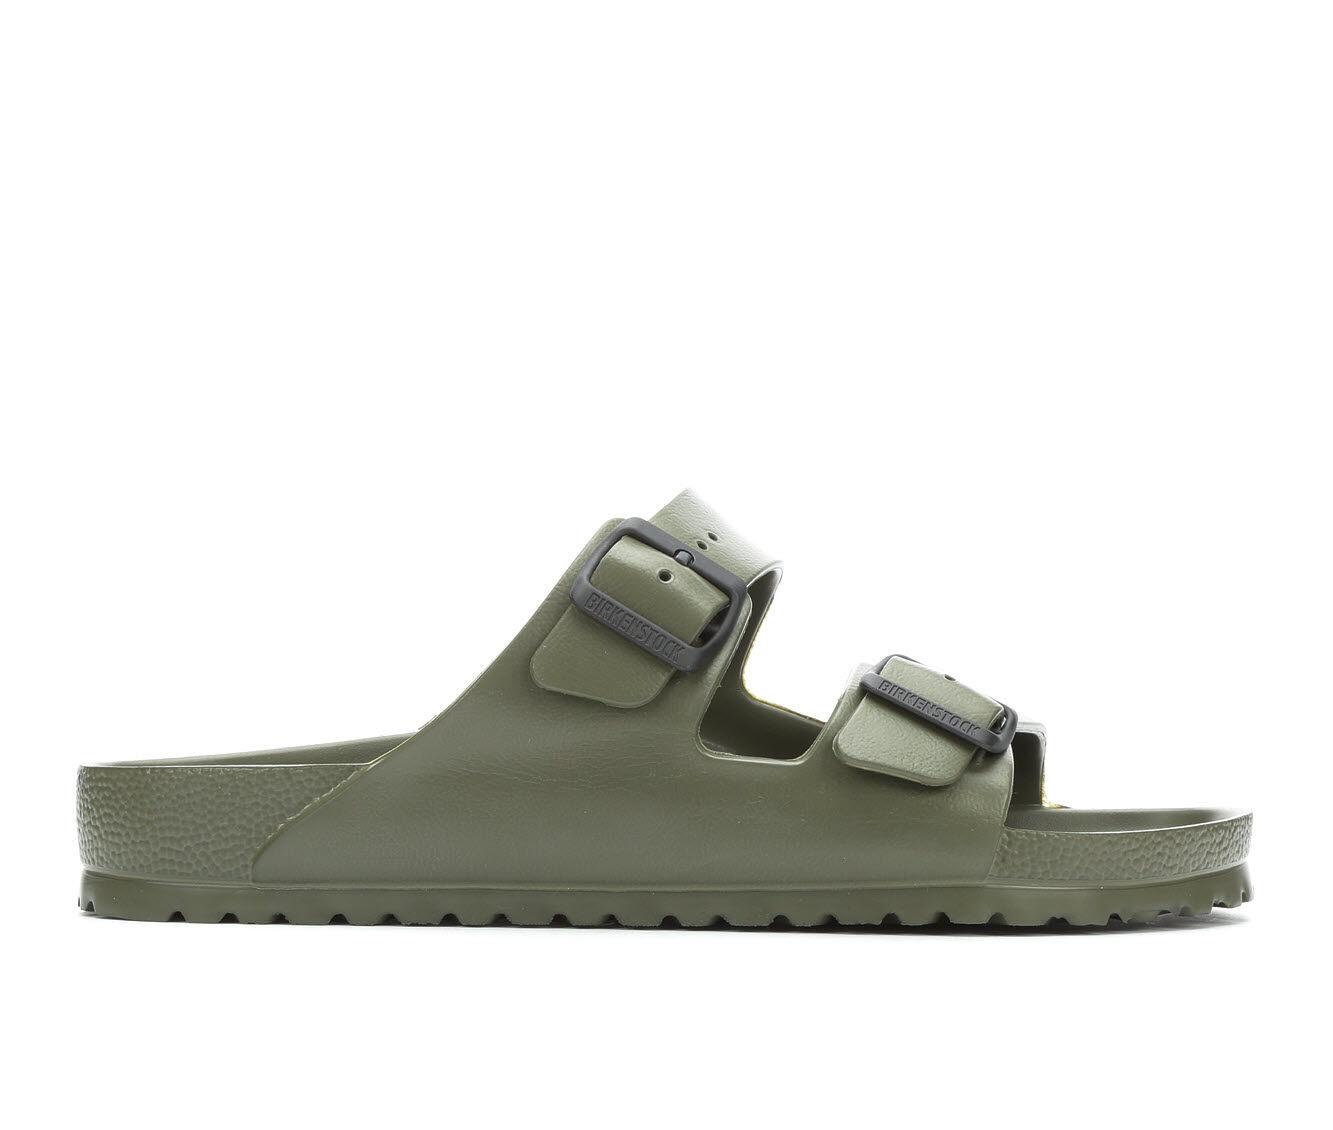 uk shoes_kd2630